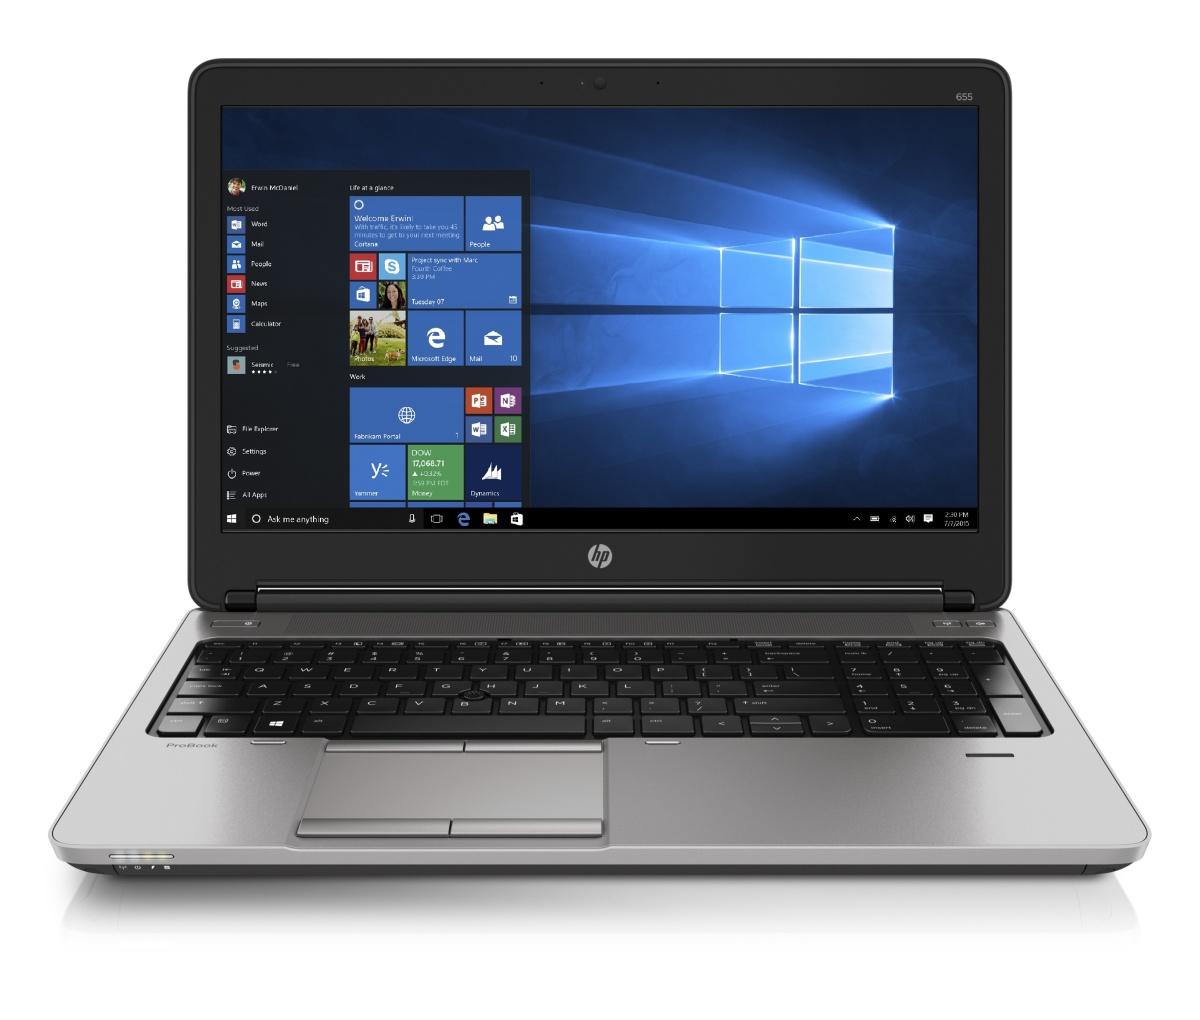 HP ProBook 655 G1 A10-5750M / 8GB / 256 GB SSD / 15,6'' FHD / Win 10 PRO + Win 7 PRO